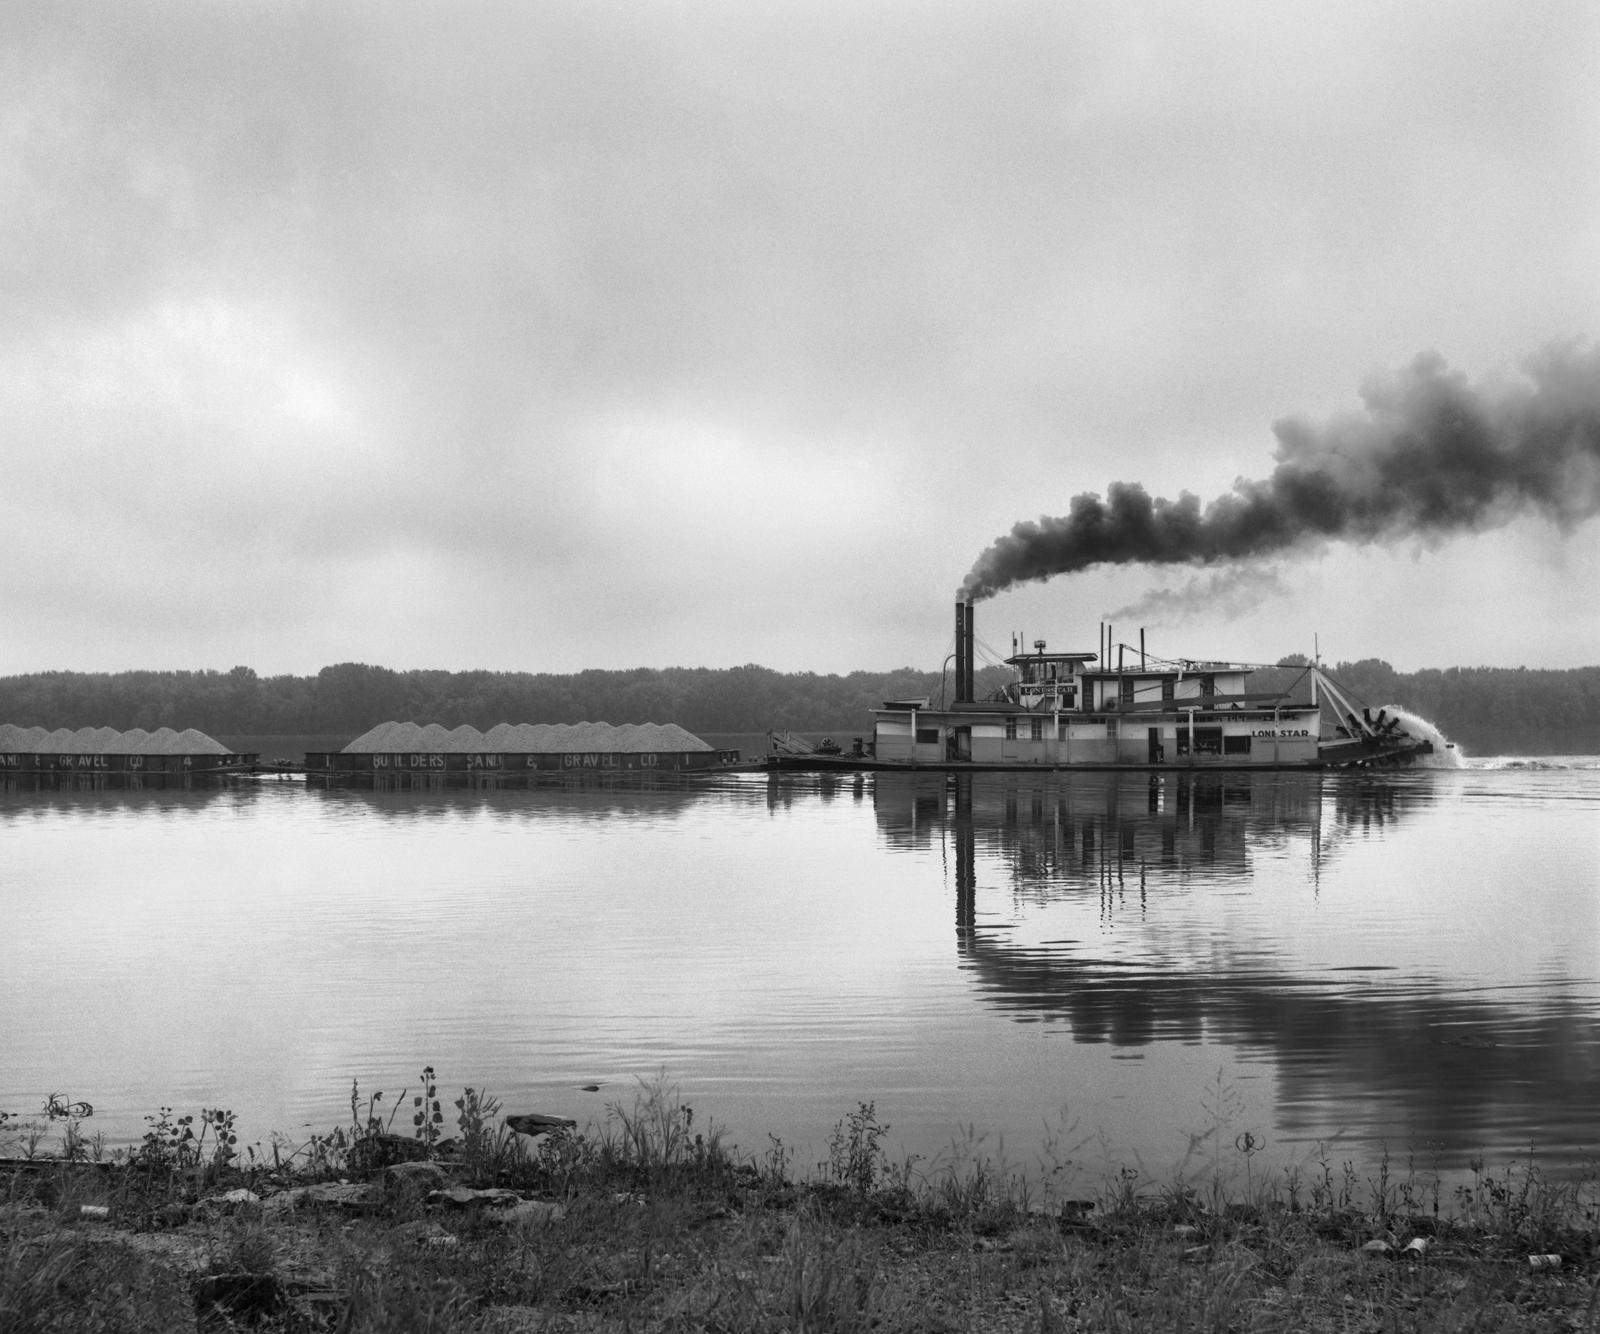 Steamer Lone Star on Mississippi River Below Davenport, Iowa, 1964